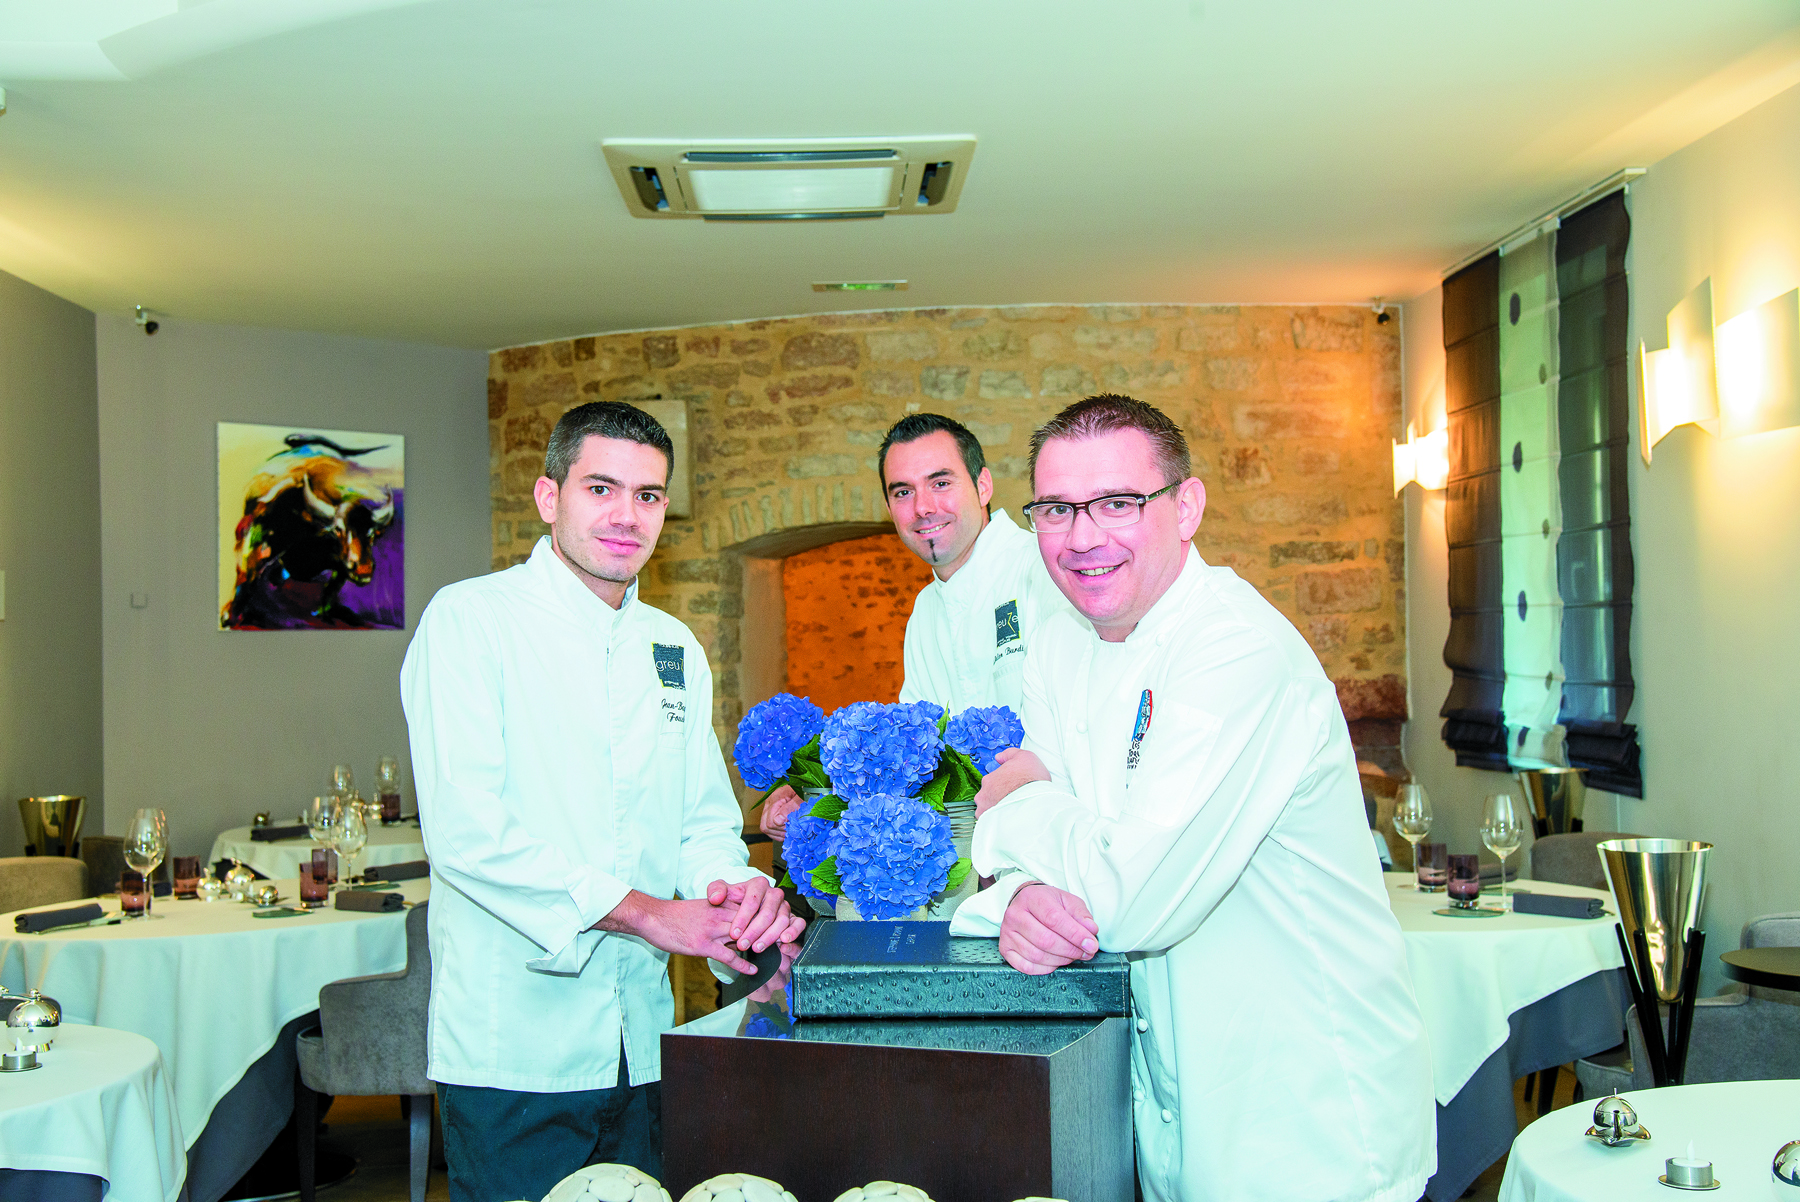 Restaurant Greuze Restaurant - Yohann Chapuis